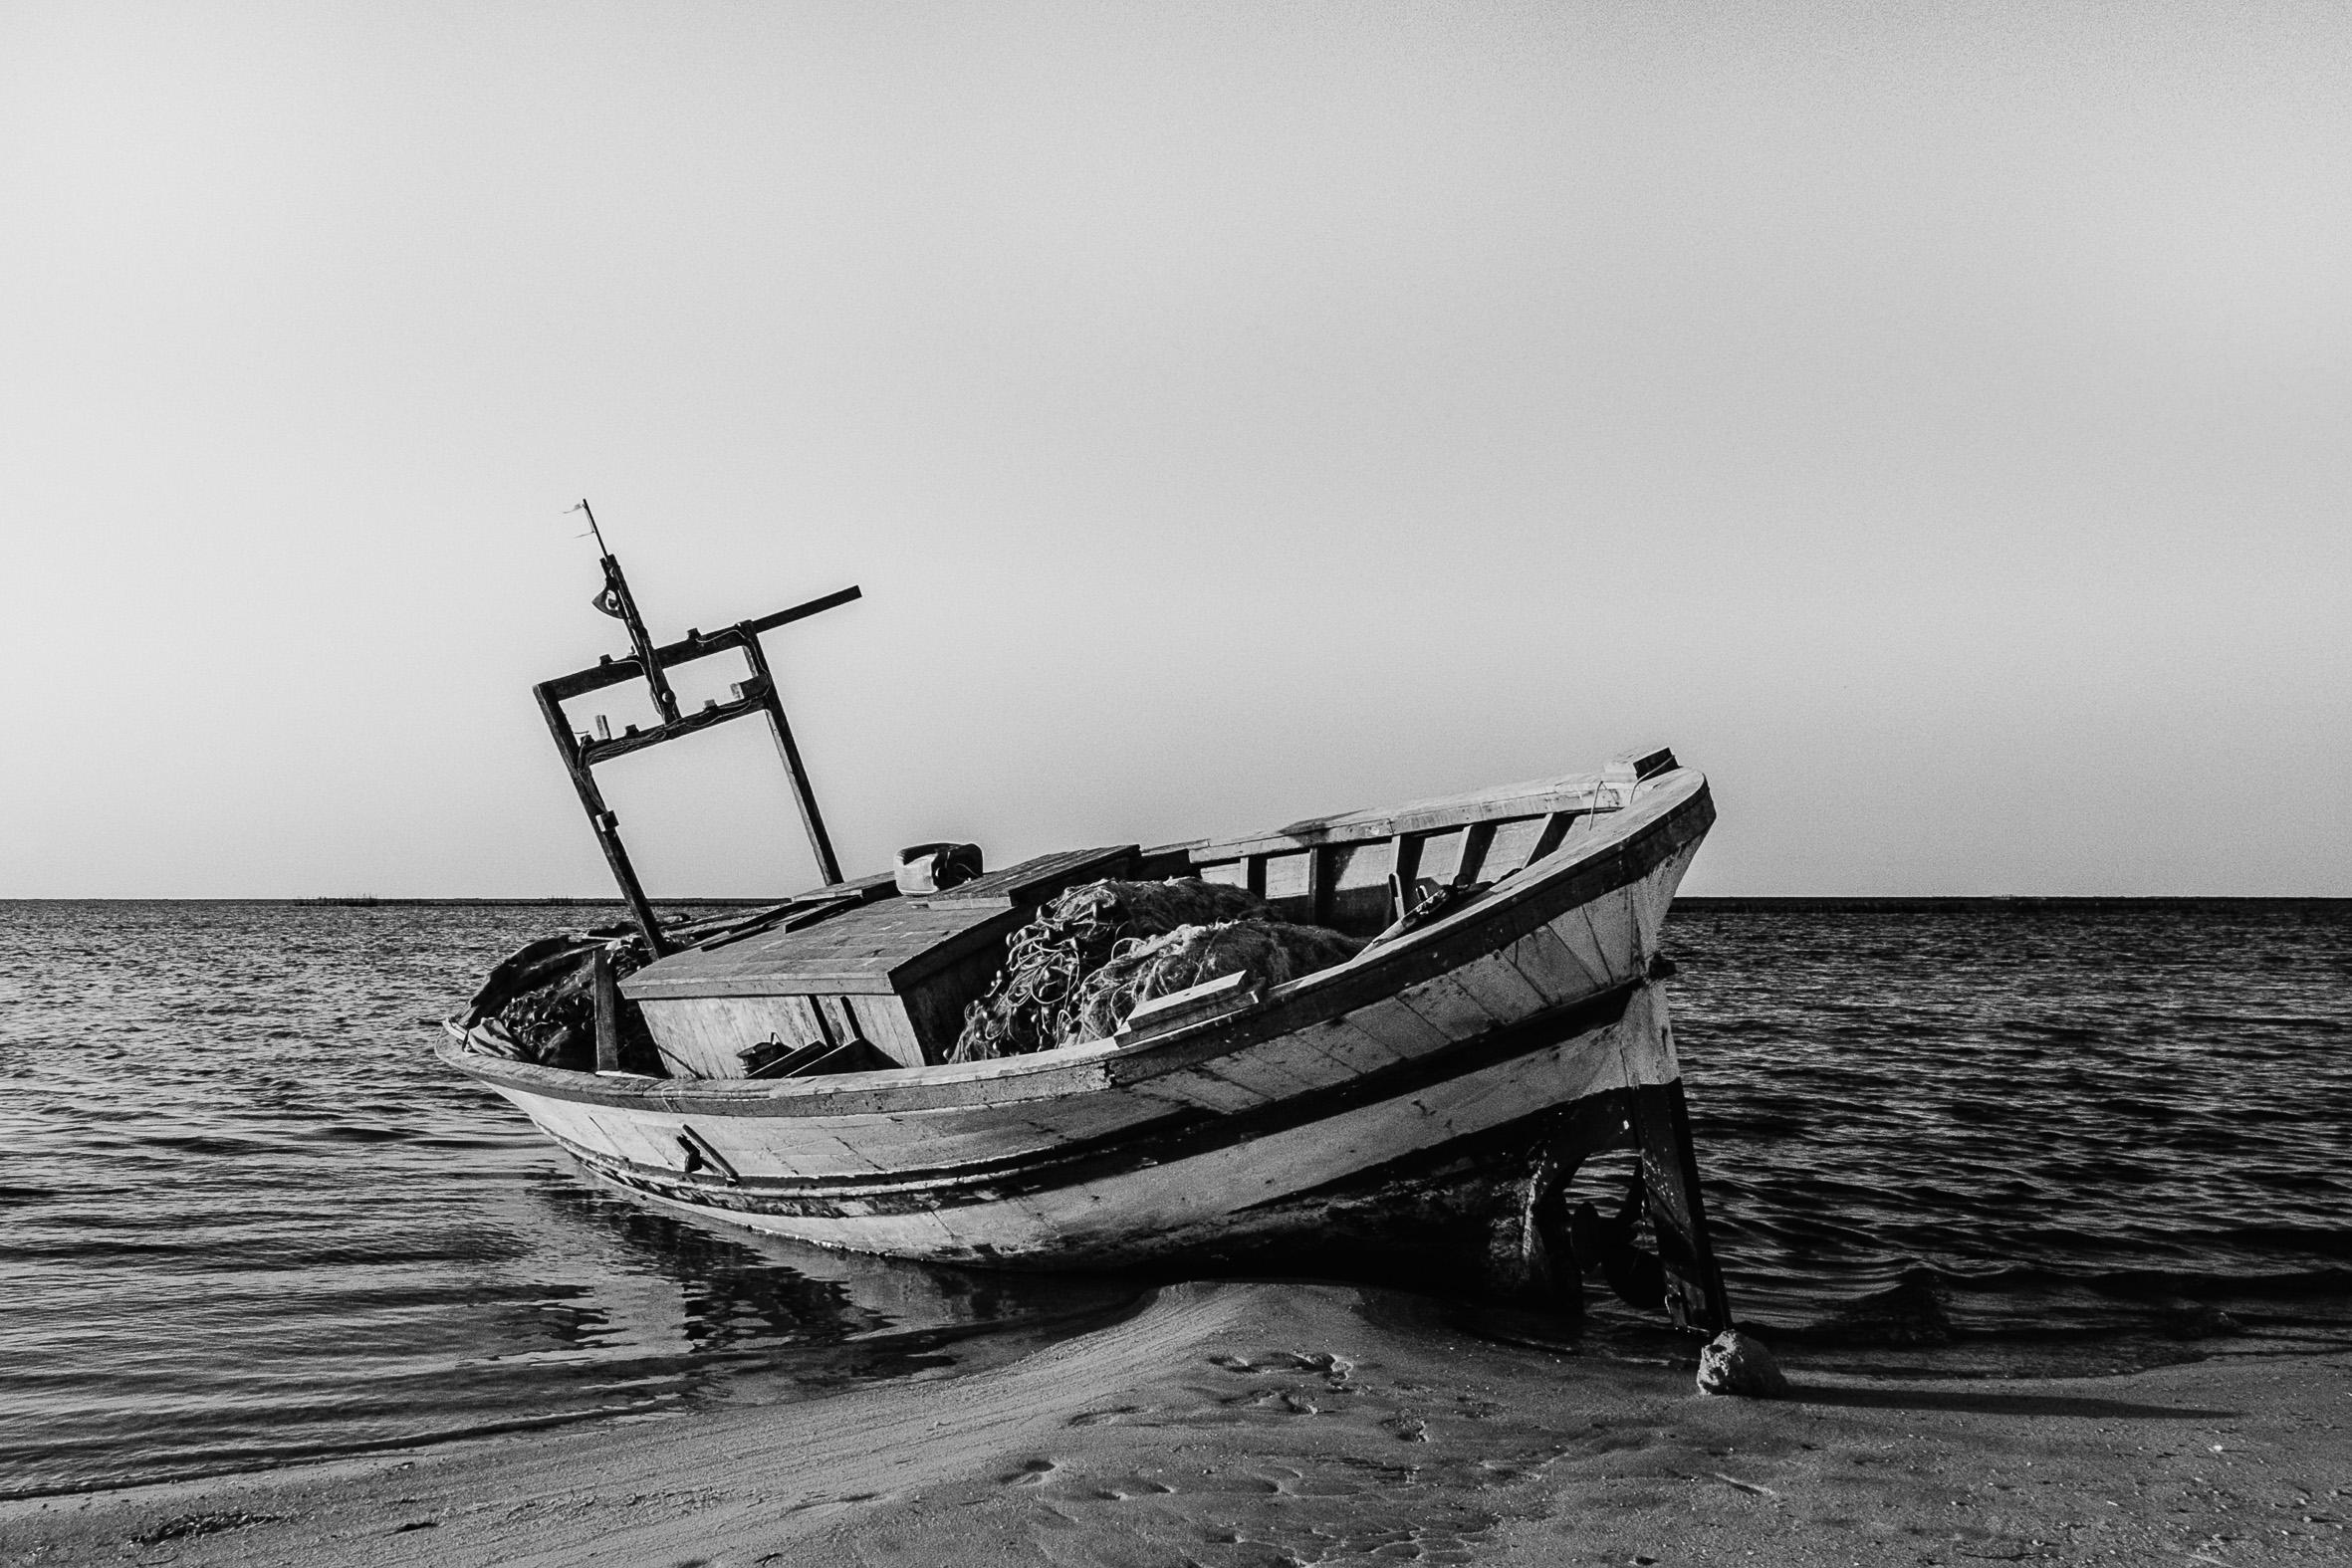 Wassim Ghozlani, Solus, Tunisie, 2014, Kerkenah